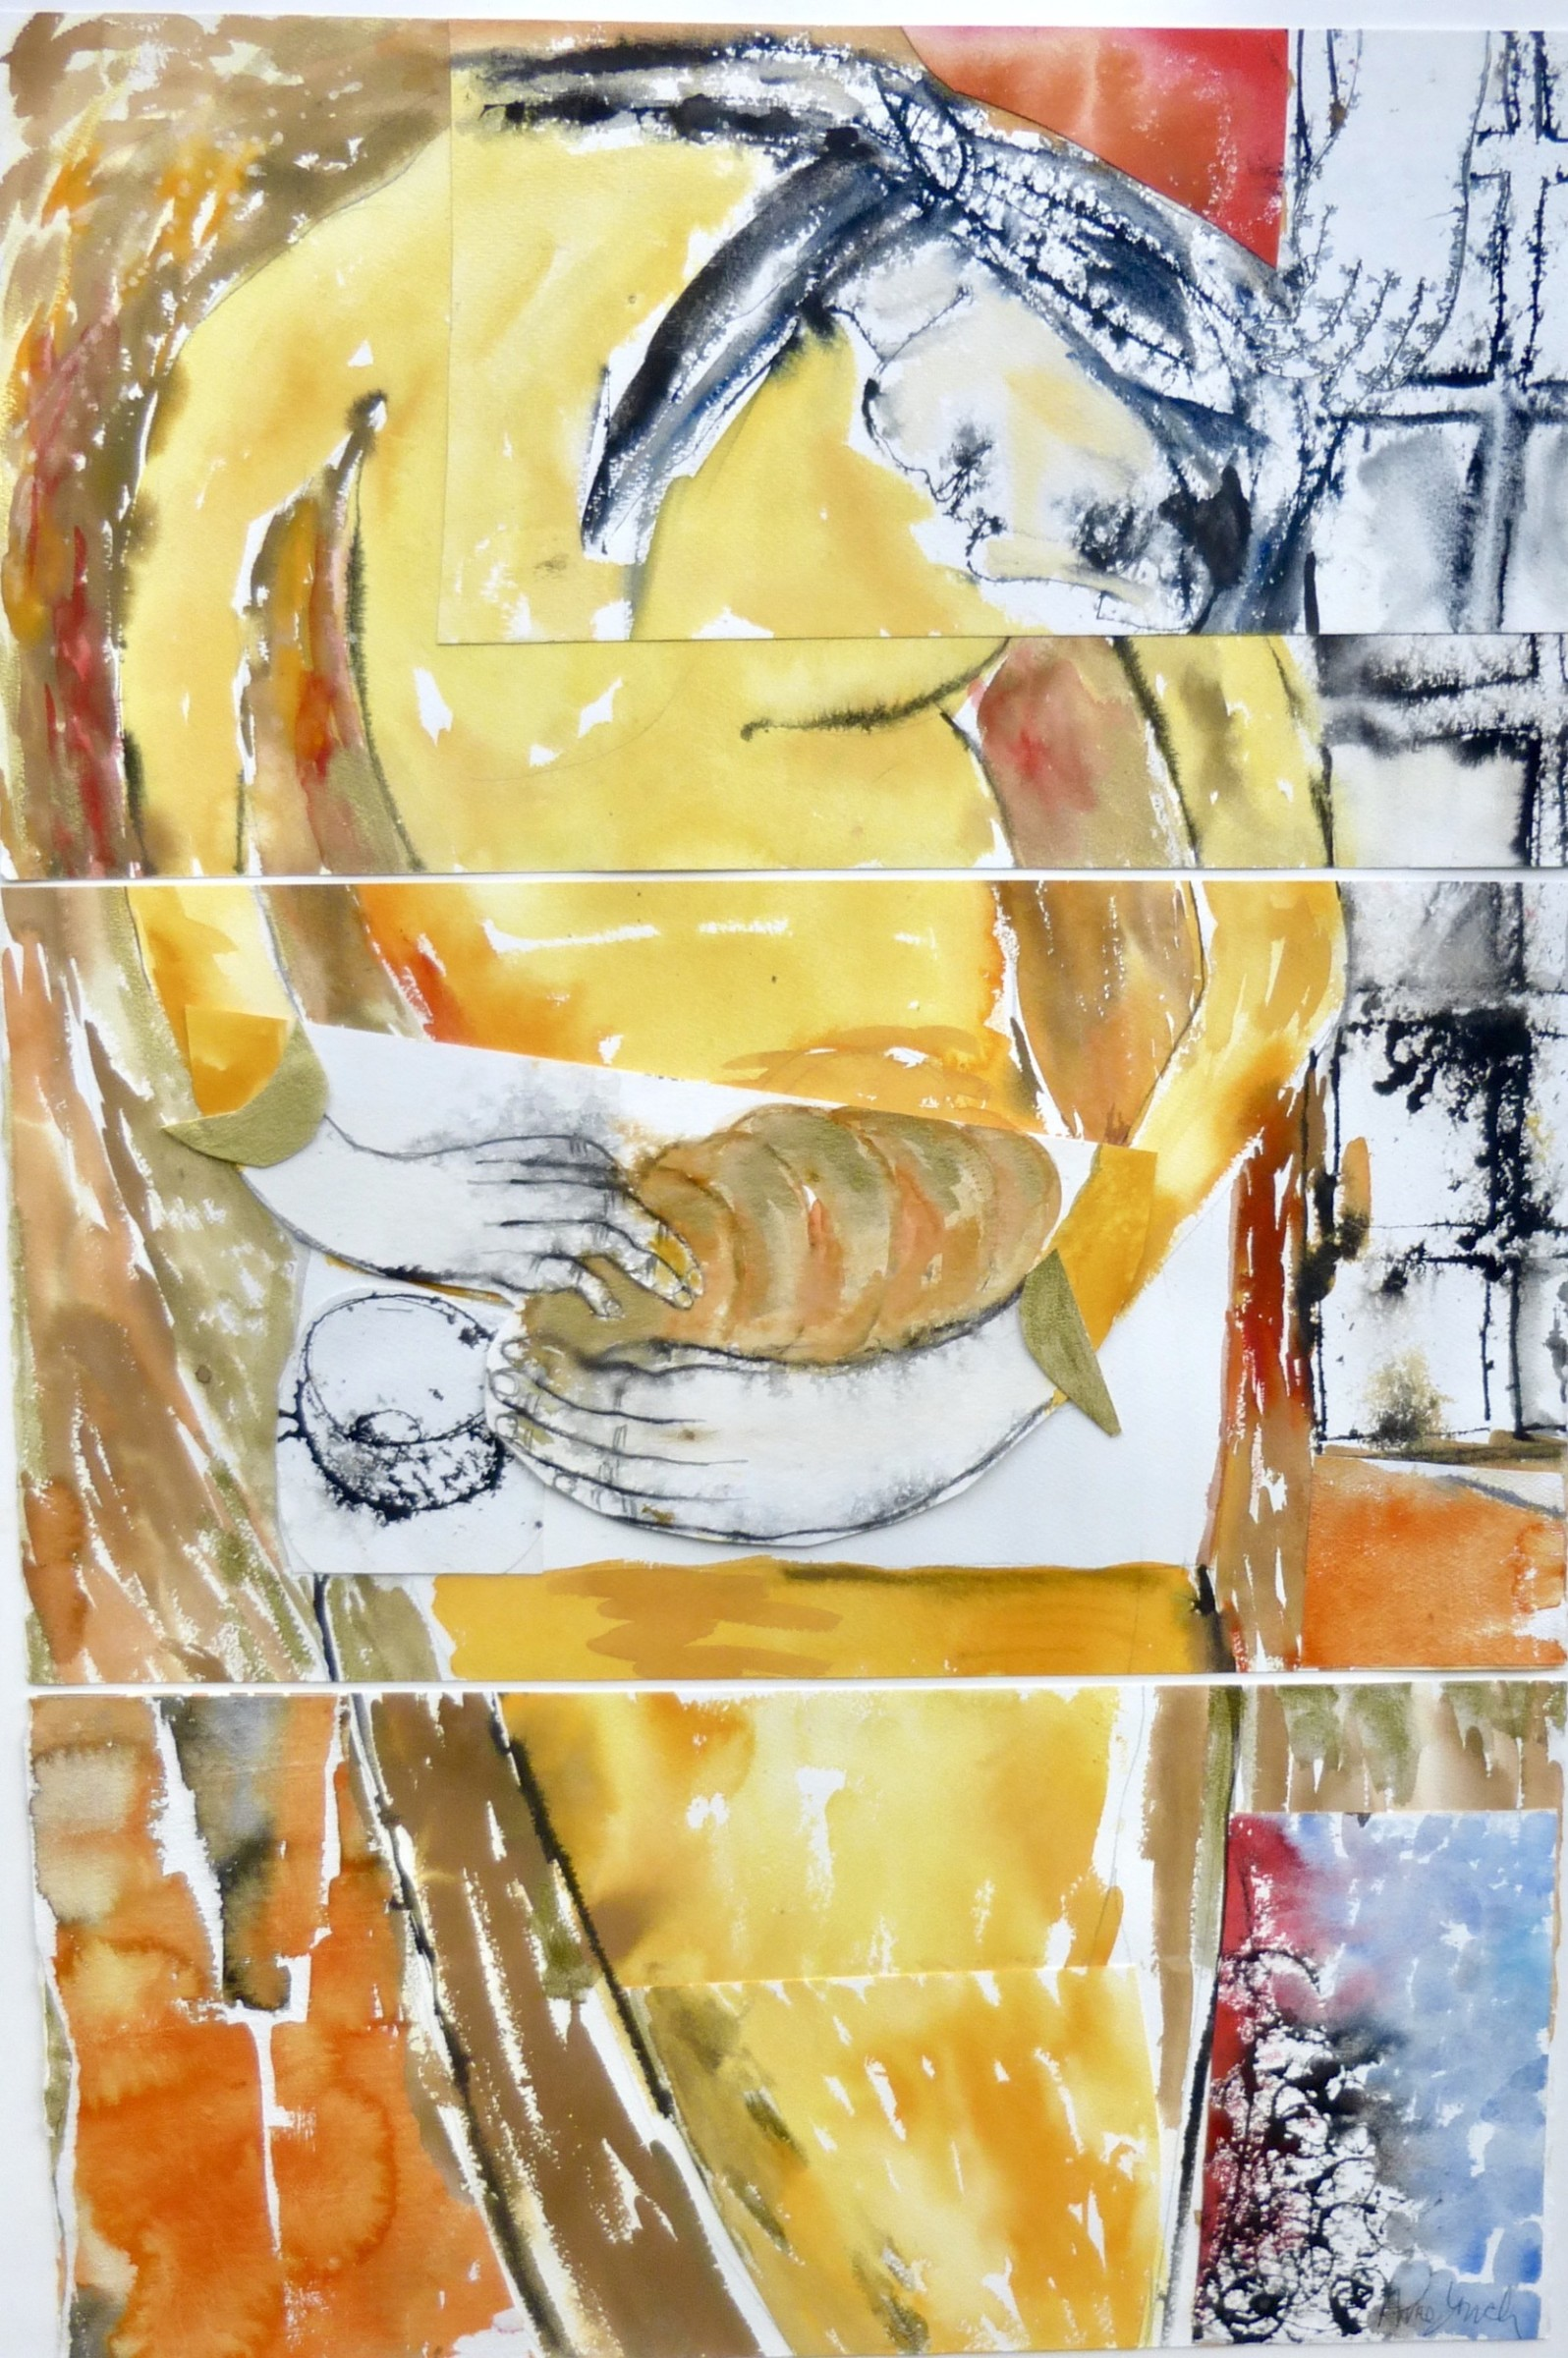 "<span class=""link fancybox-details-link""><a href=""/artists/314-anne-lynch/works/12406-anne-lynch-preparing-with-care/"">View Detail Page</a></span><div class=""artist""><span class=""artist""><strong>Anne Lynch</strong></span></div><div class=""title""><em>Preparing with Care</em></div><div class=""medium"">watercolour</div><div class=""dimensions"">Frame: 110 x 75 cm<br /> </div><div class=""price"">£1,100.00</div>"